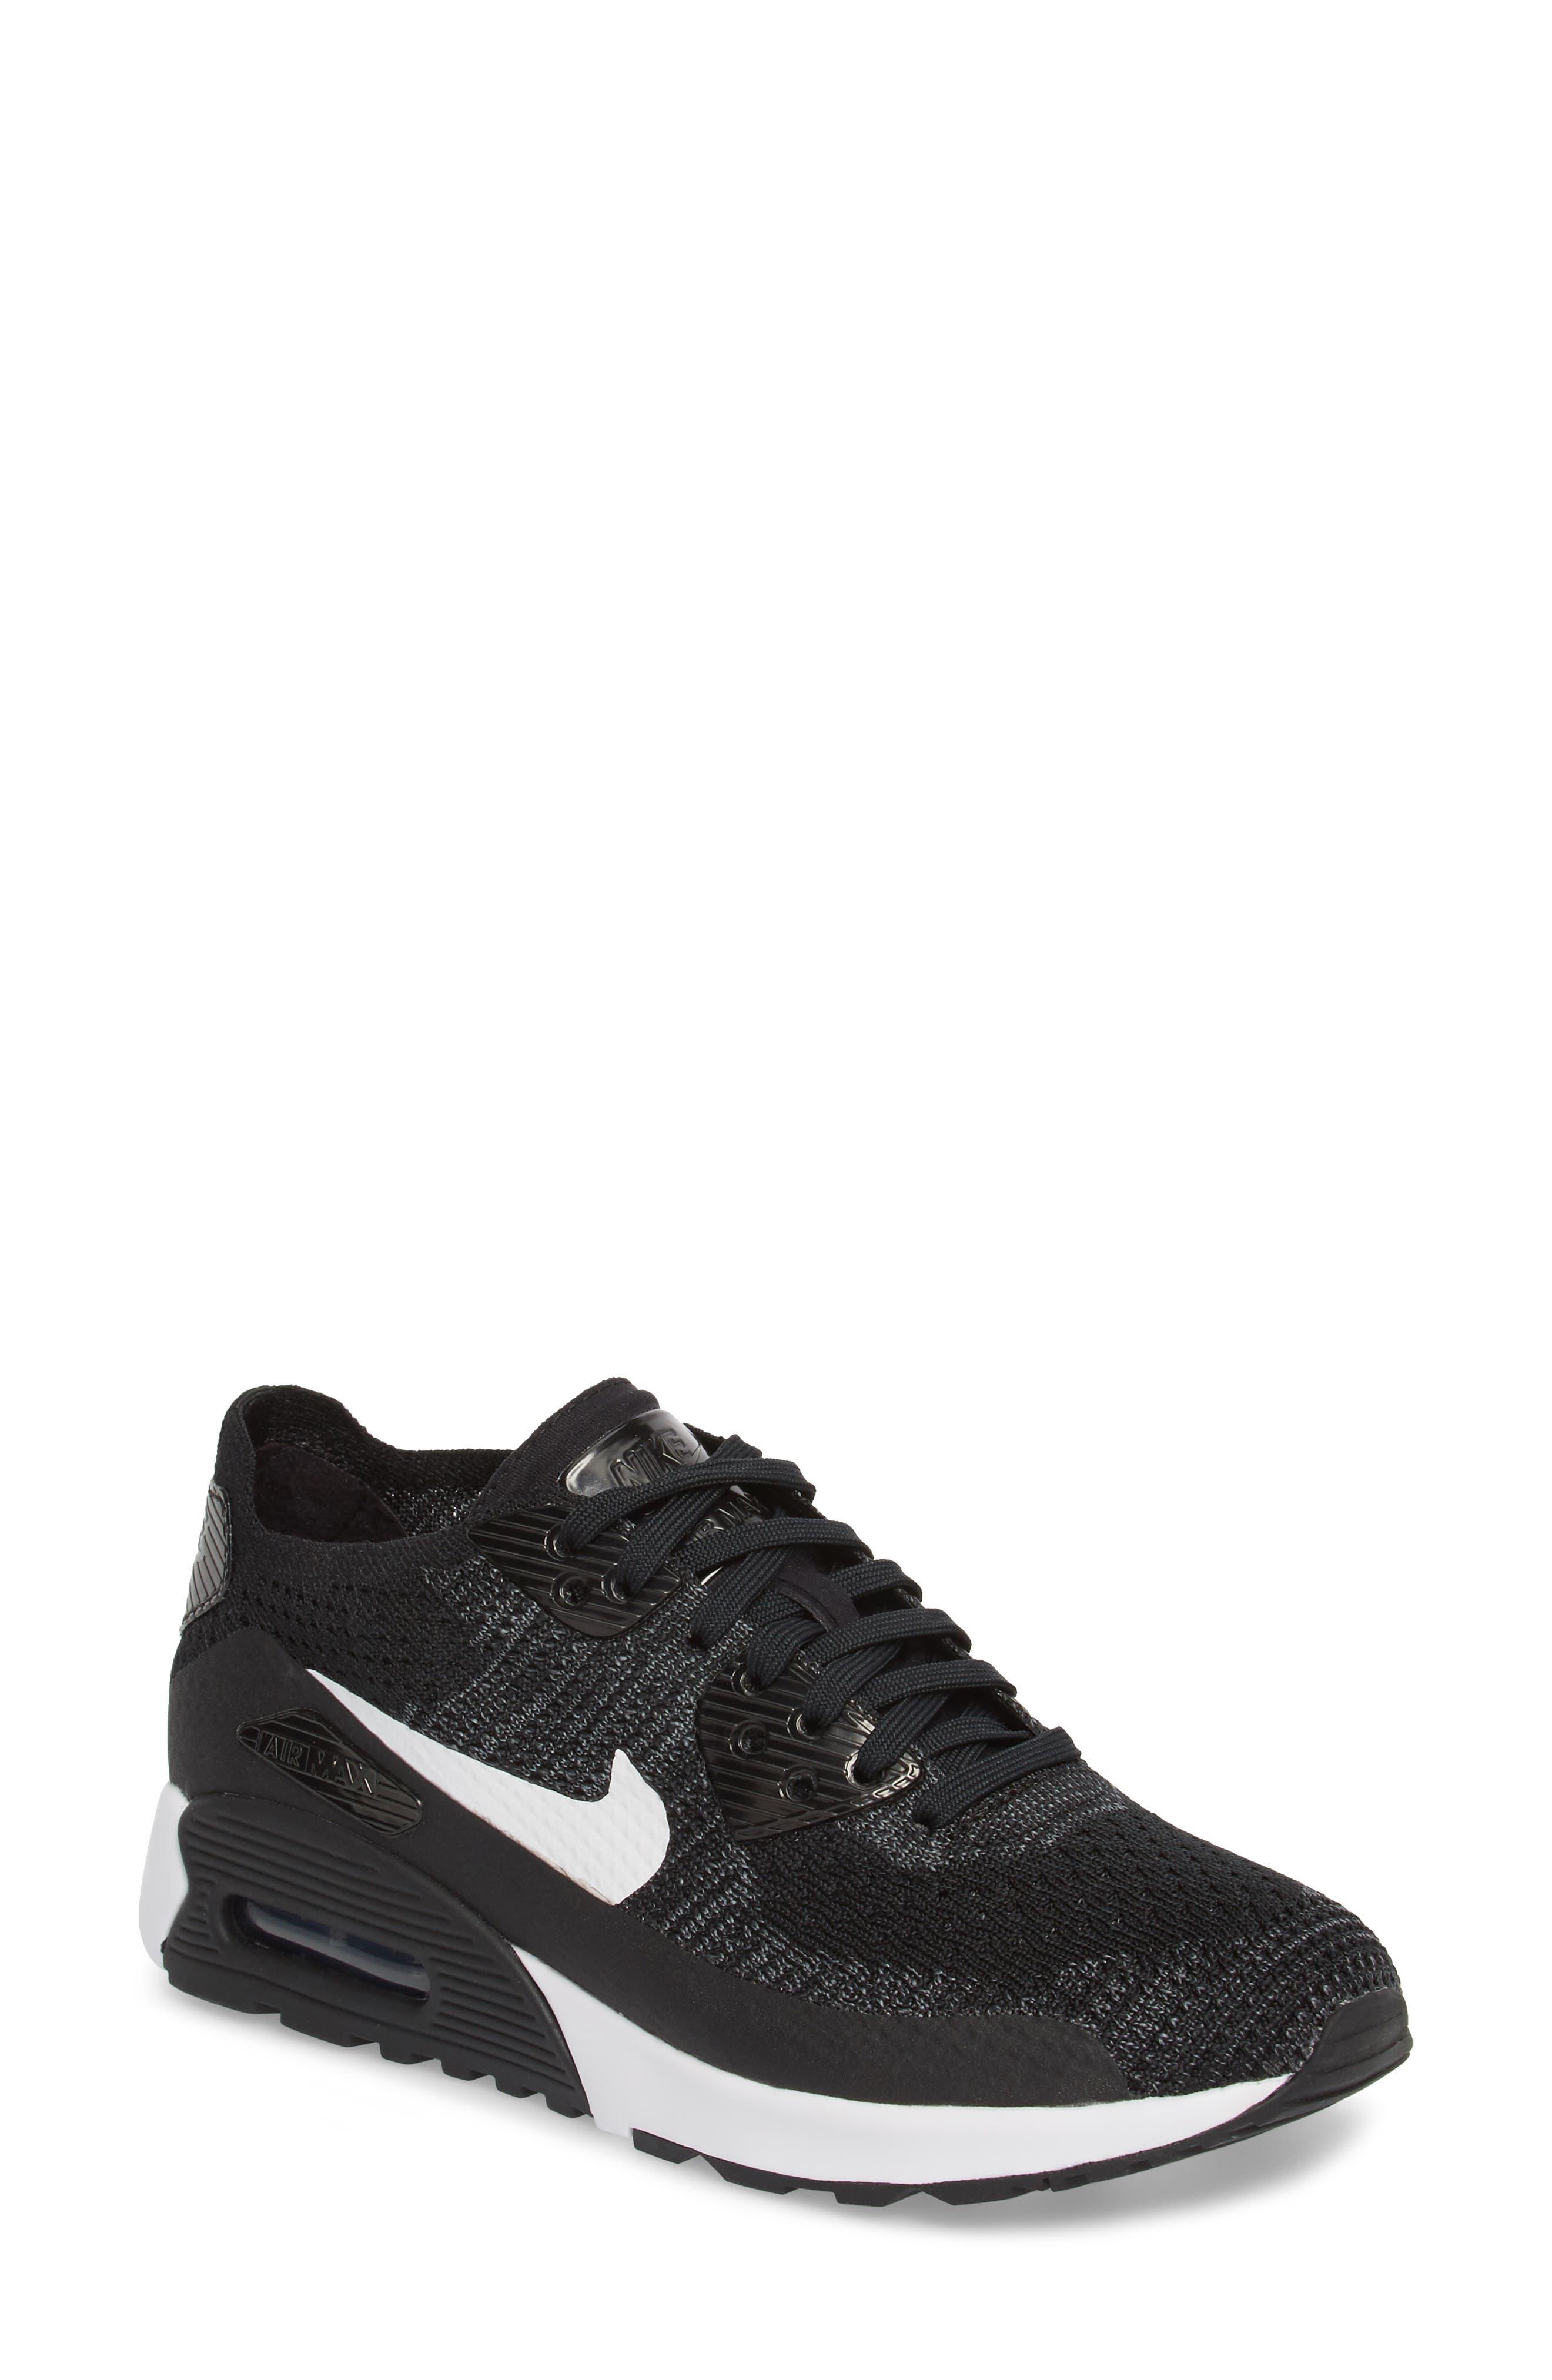 Air Max 90 Flyknit Ultra 2.0 Sneaker,                         Main,                         color, Black/ White/ Dark Grey